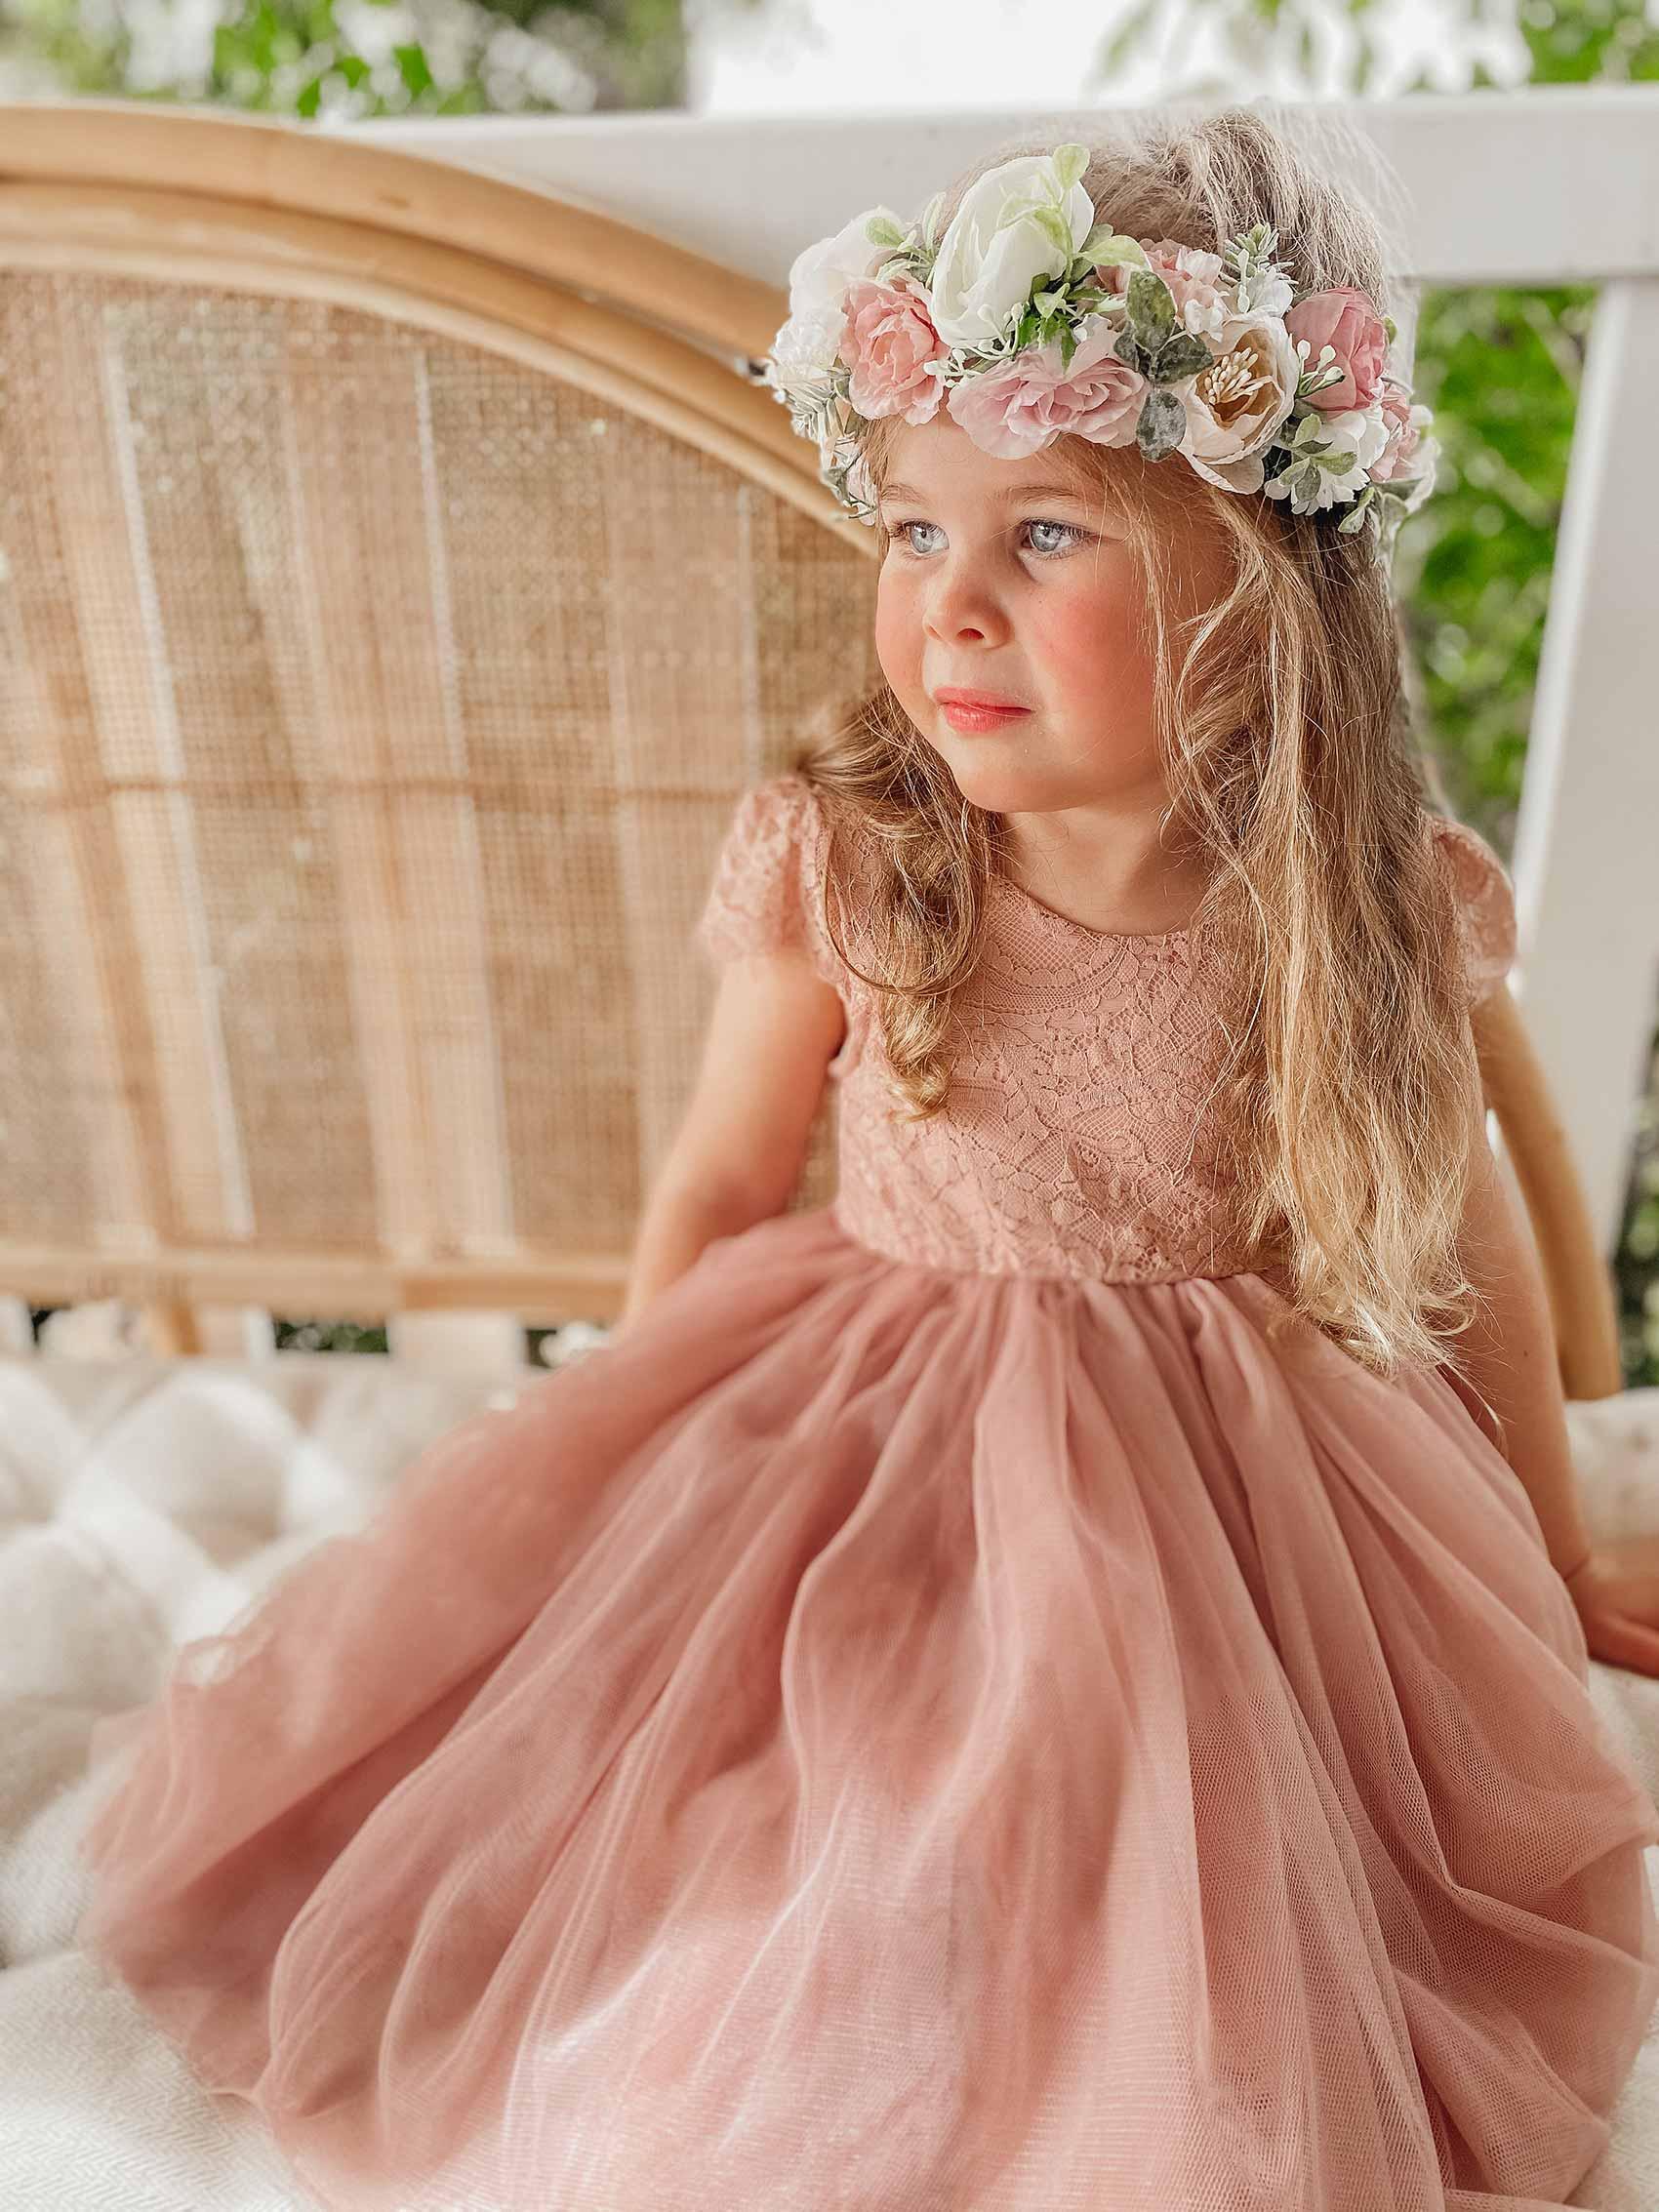 Dusty Rose Flora Capped Sleeve Lace Back Dress Adeline Flower Crown